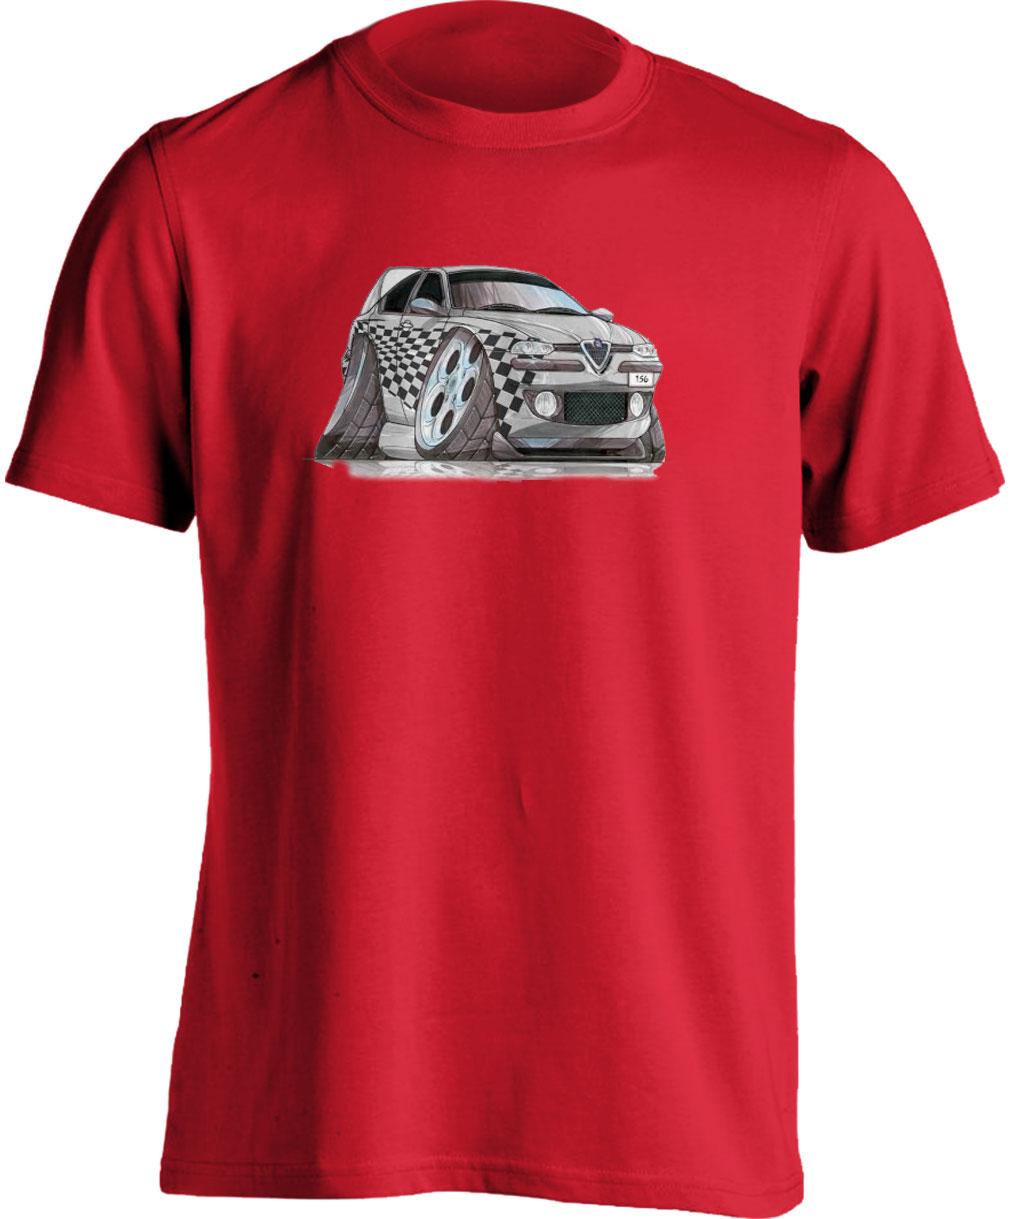 Koolart 156 Tuning Silver–2785 Alfa Romeo Child's T Shirt